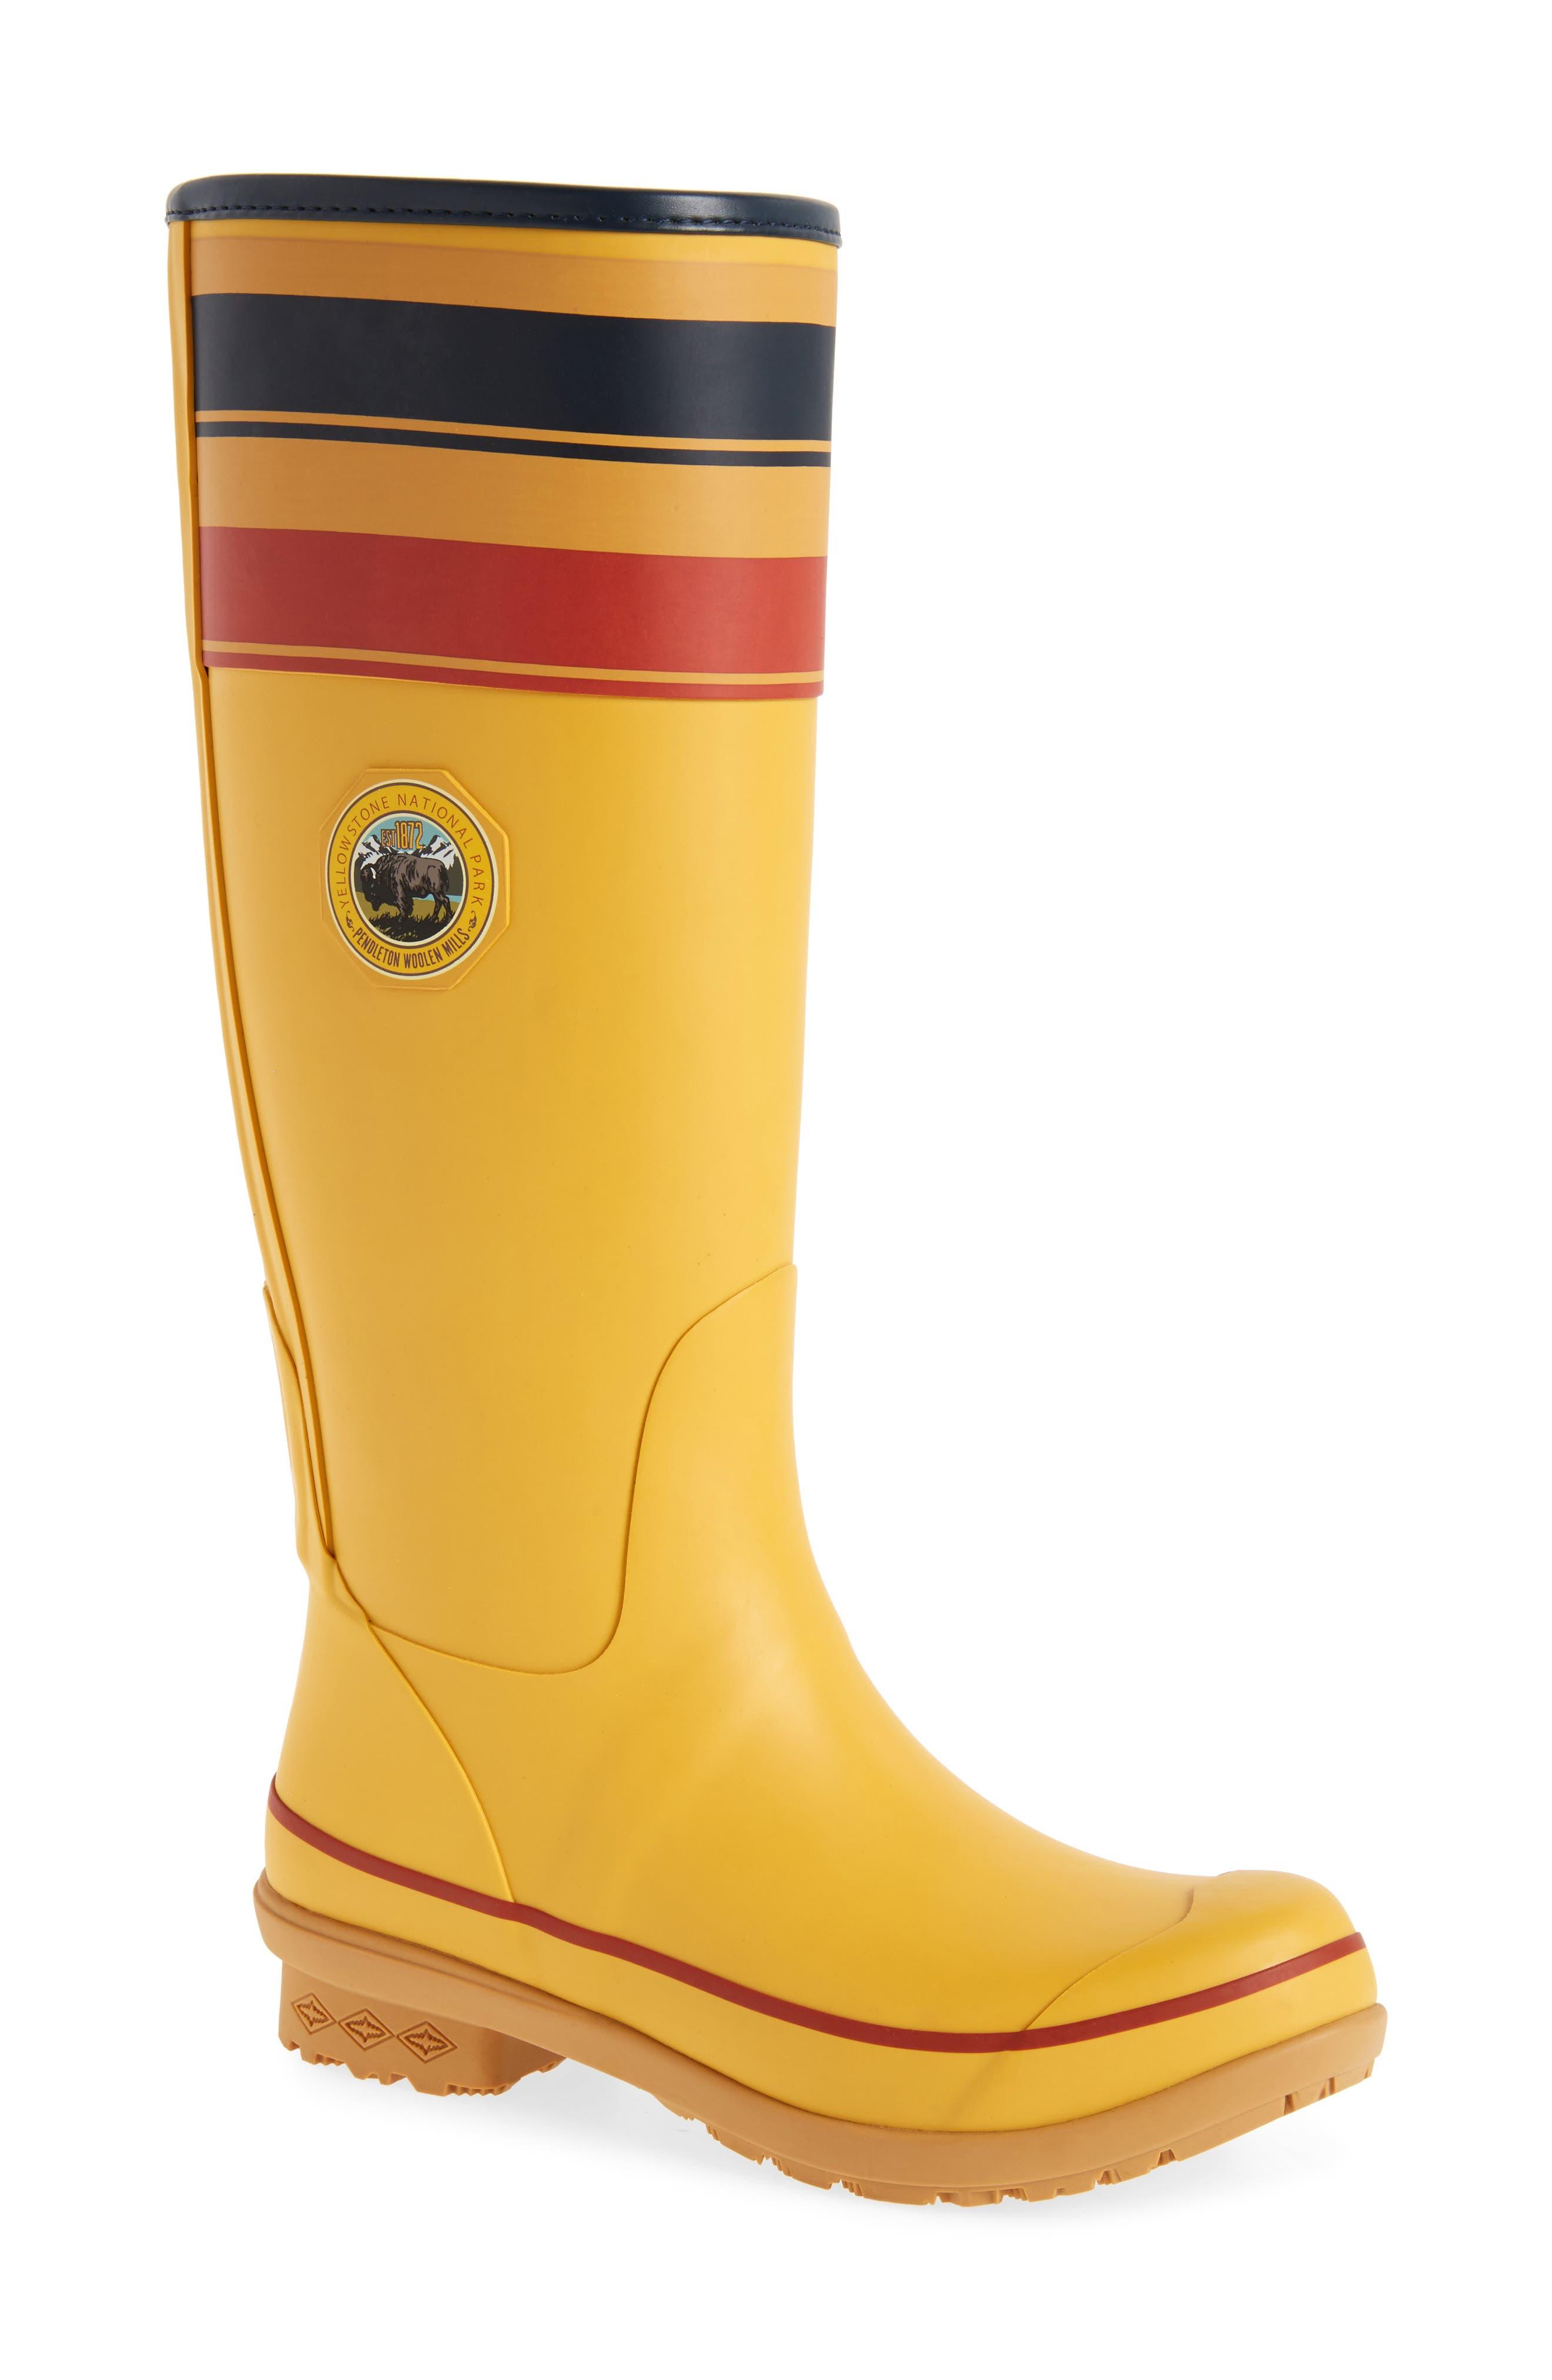 Main Image - Pendleton Yellowstone National Park Tall Rain Boot (Women)